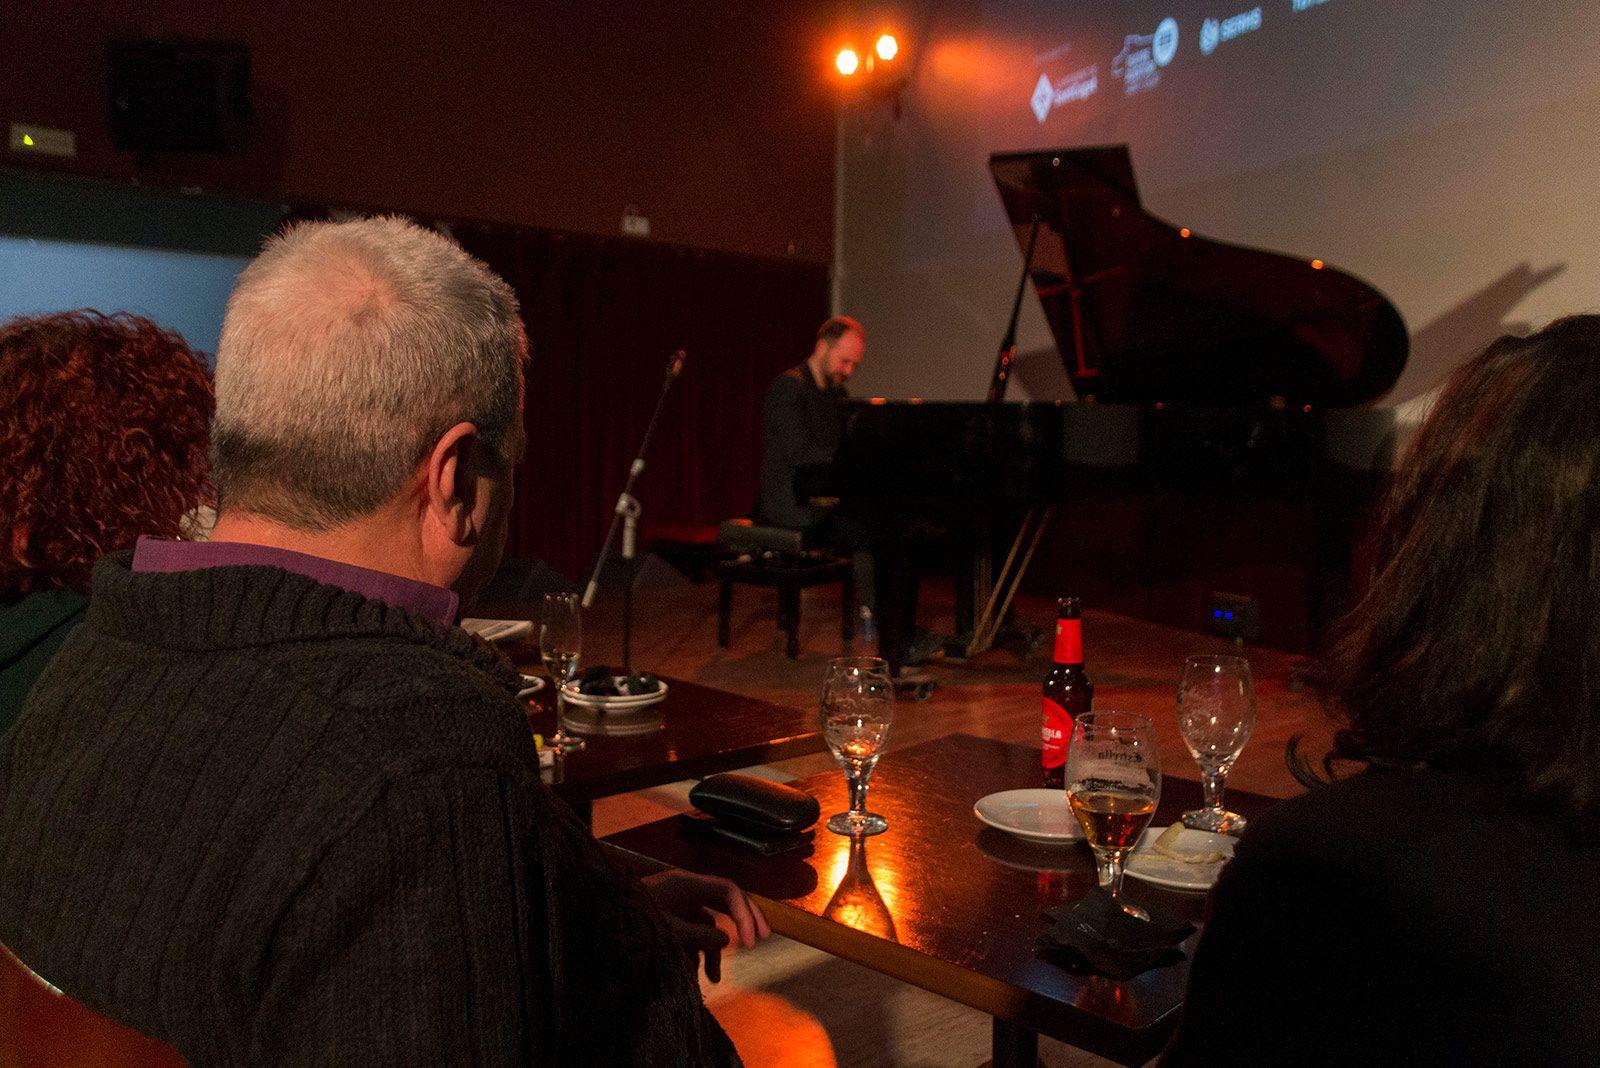 Jazzenviu al Cafè Auditori amb Roger Mas. FOTO: Paula Galván